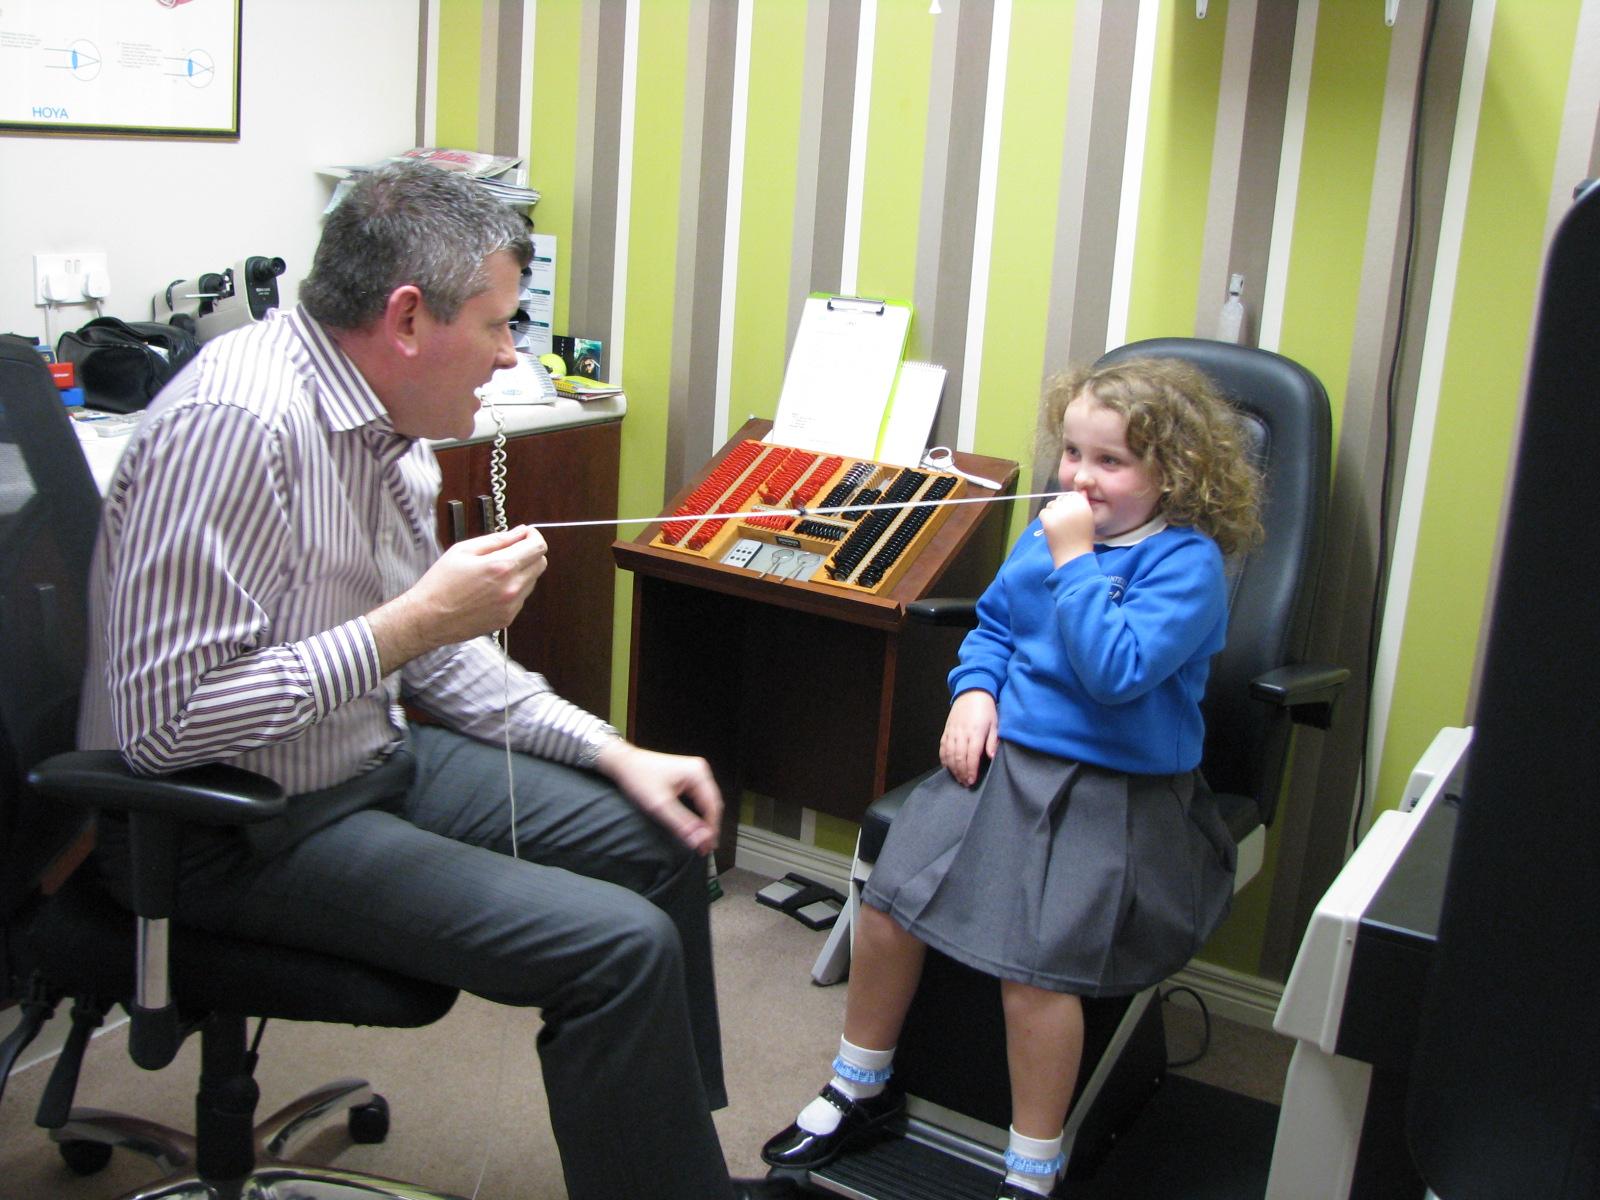 dyslexia eye test